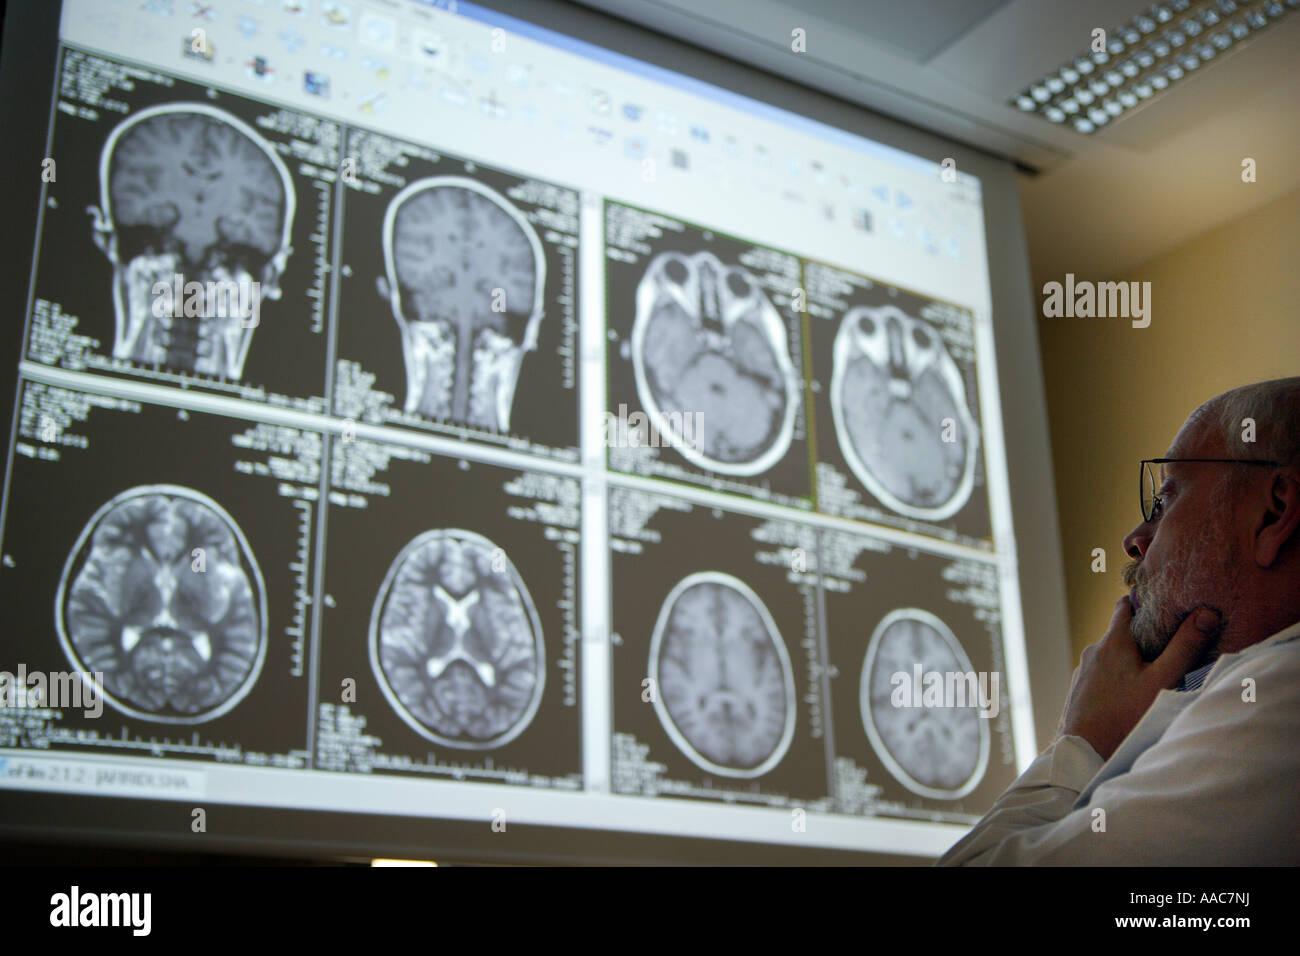 Altona children s hospital Radiologist during the evaluation of radiographs - Stock Image